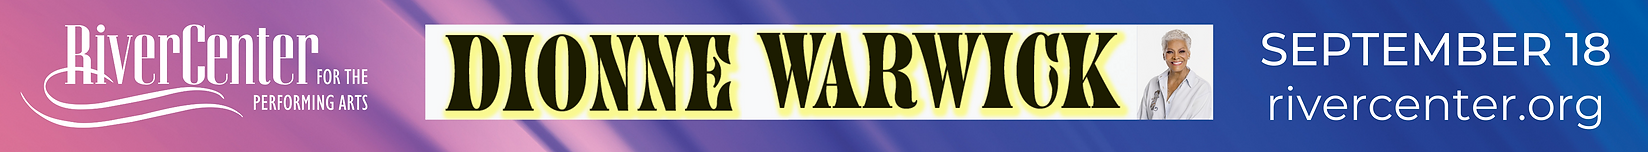 Dionne Warwick-Columbusite 4075 x 375.png